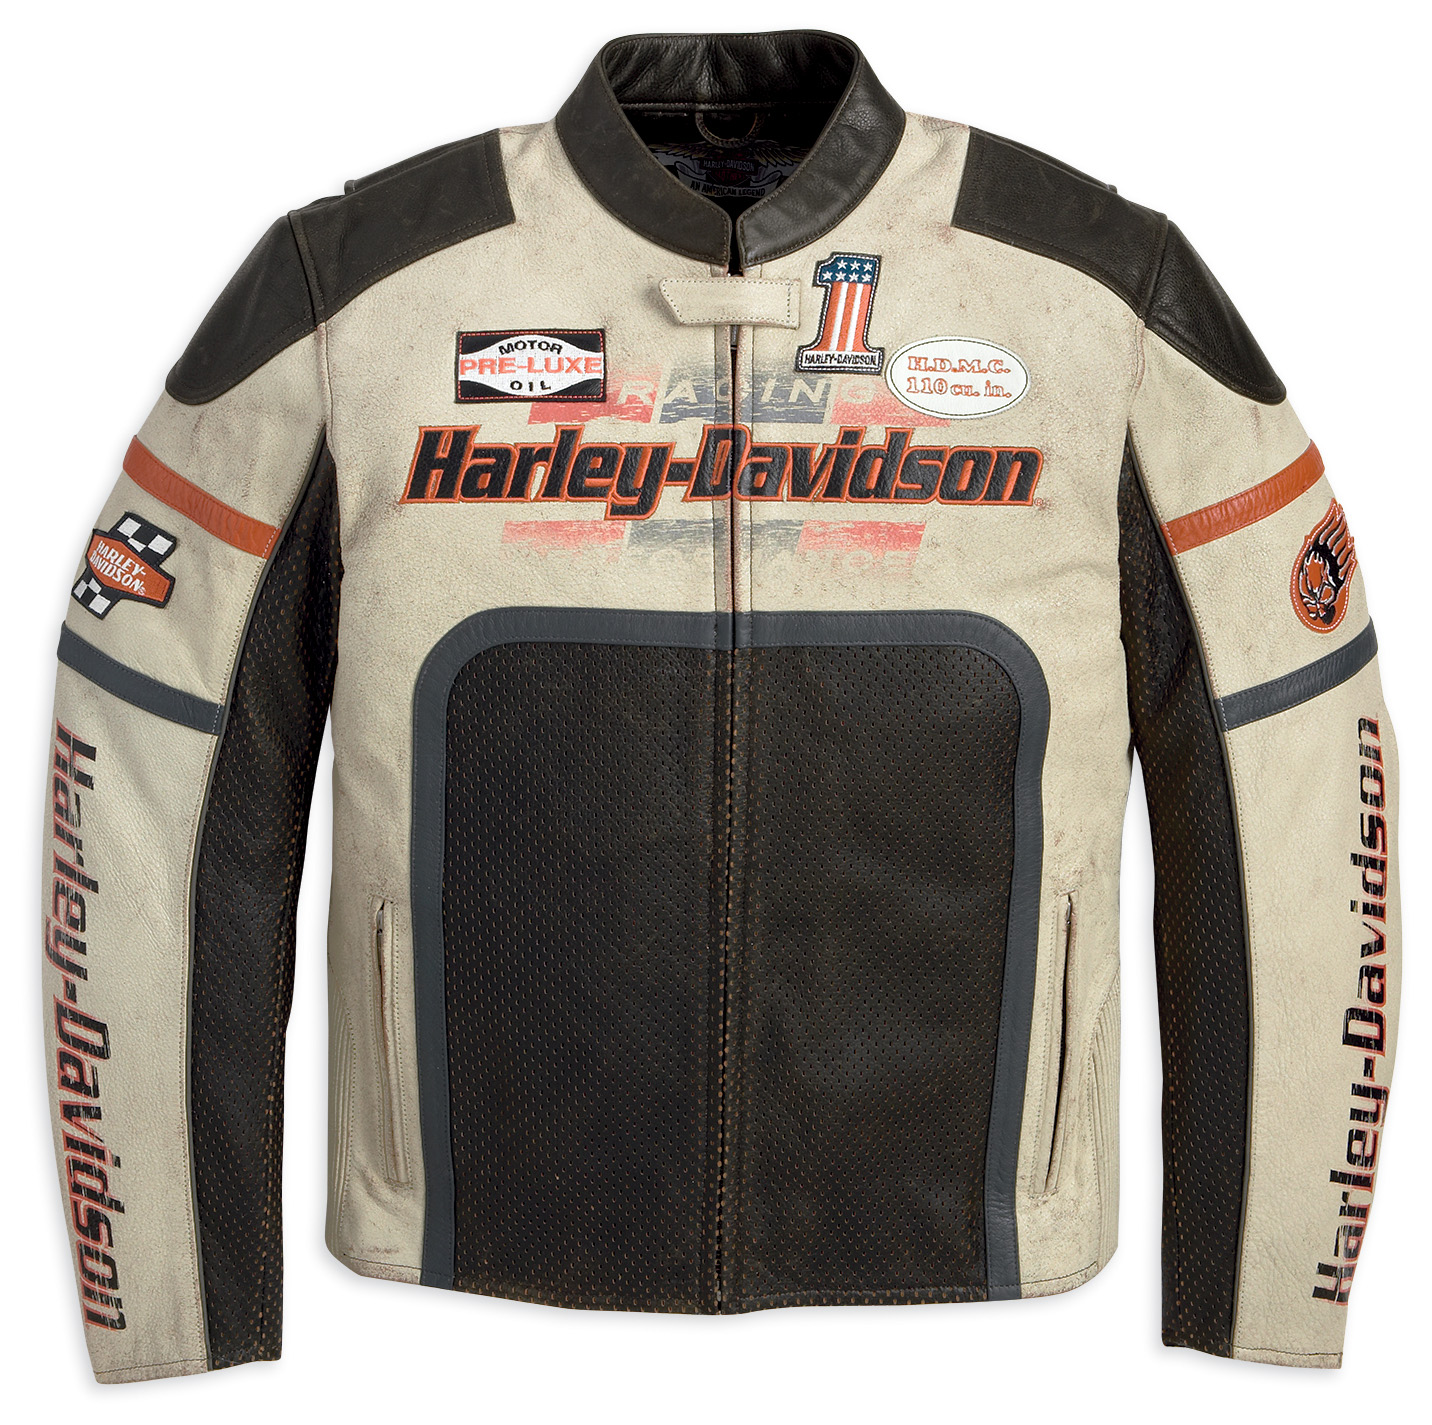 Harley Davidson Riding Gear Ebay Kuenzi Turf Nursery